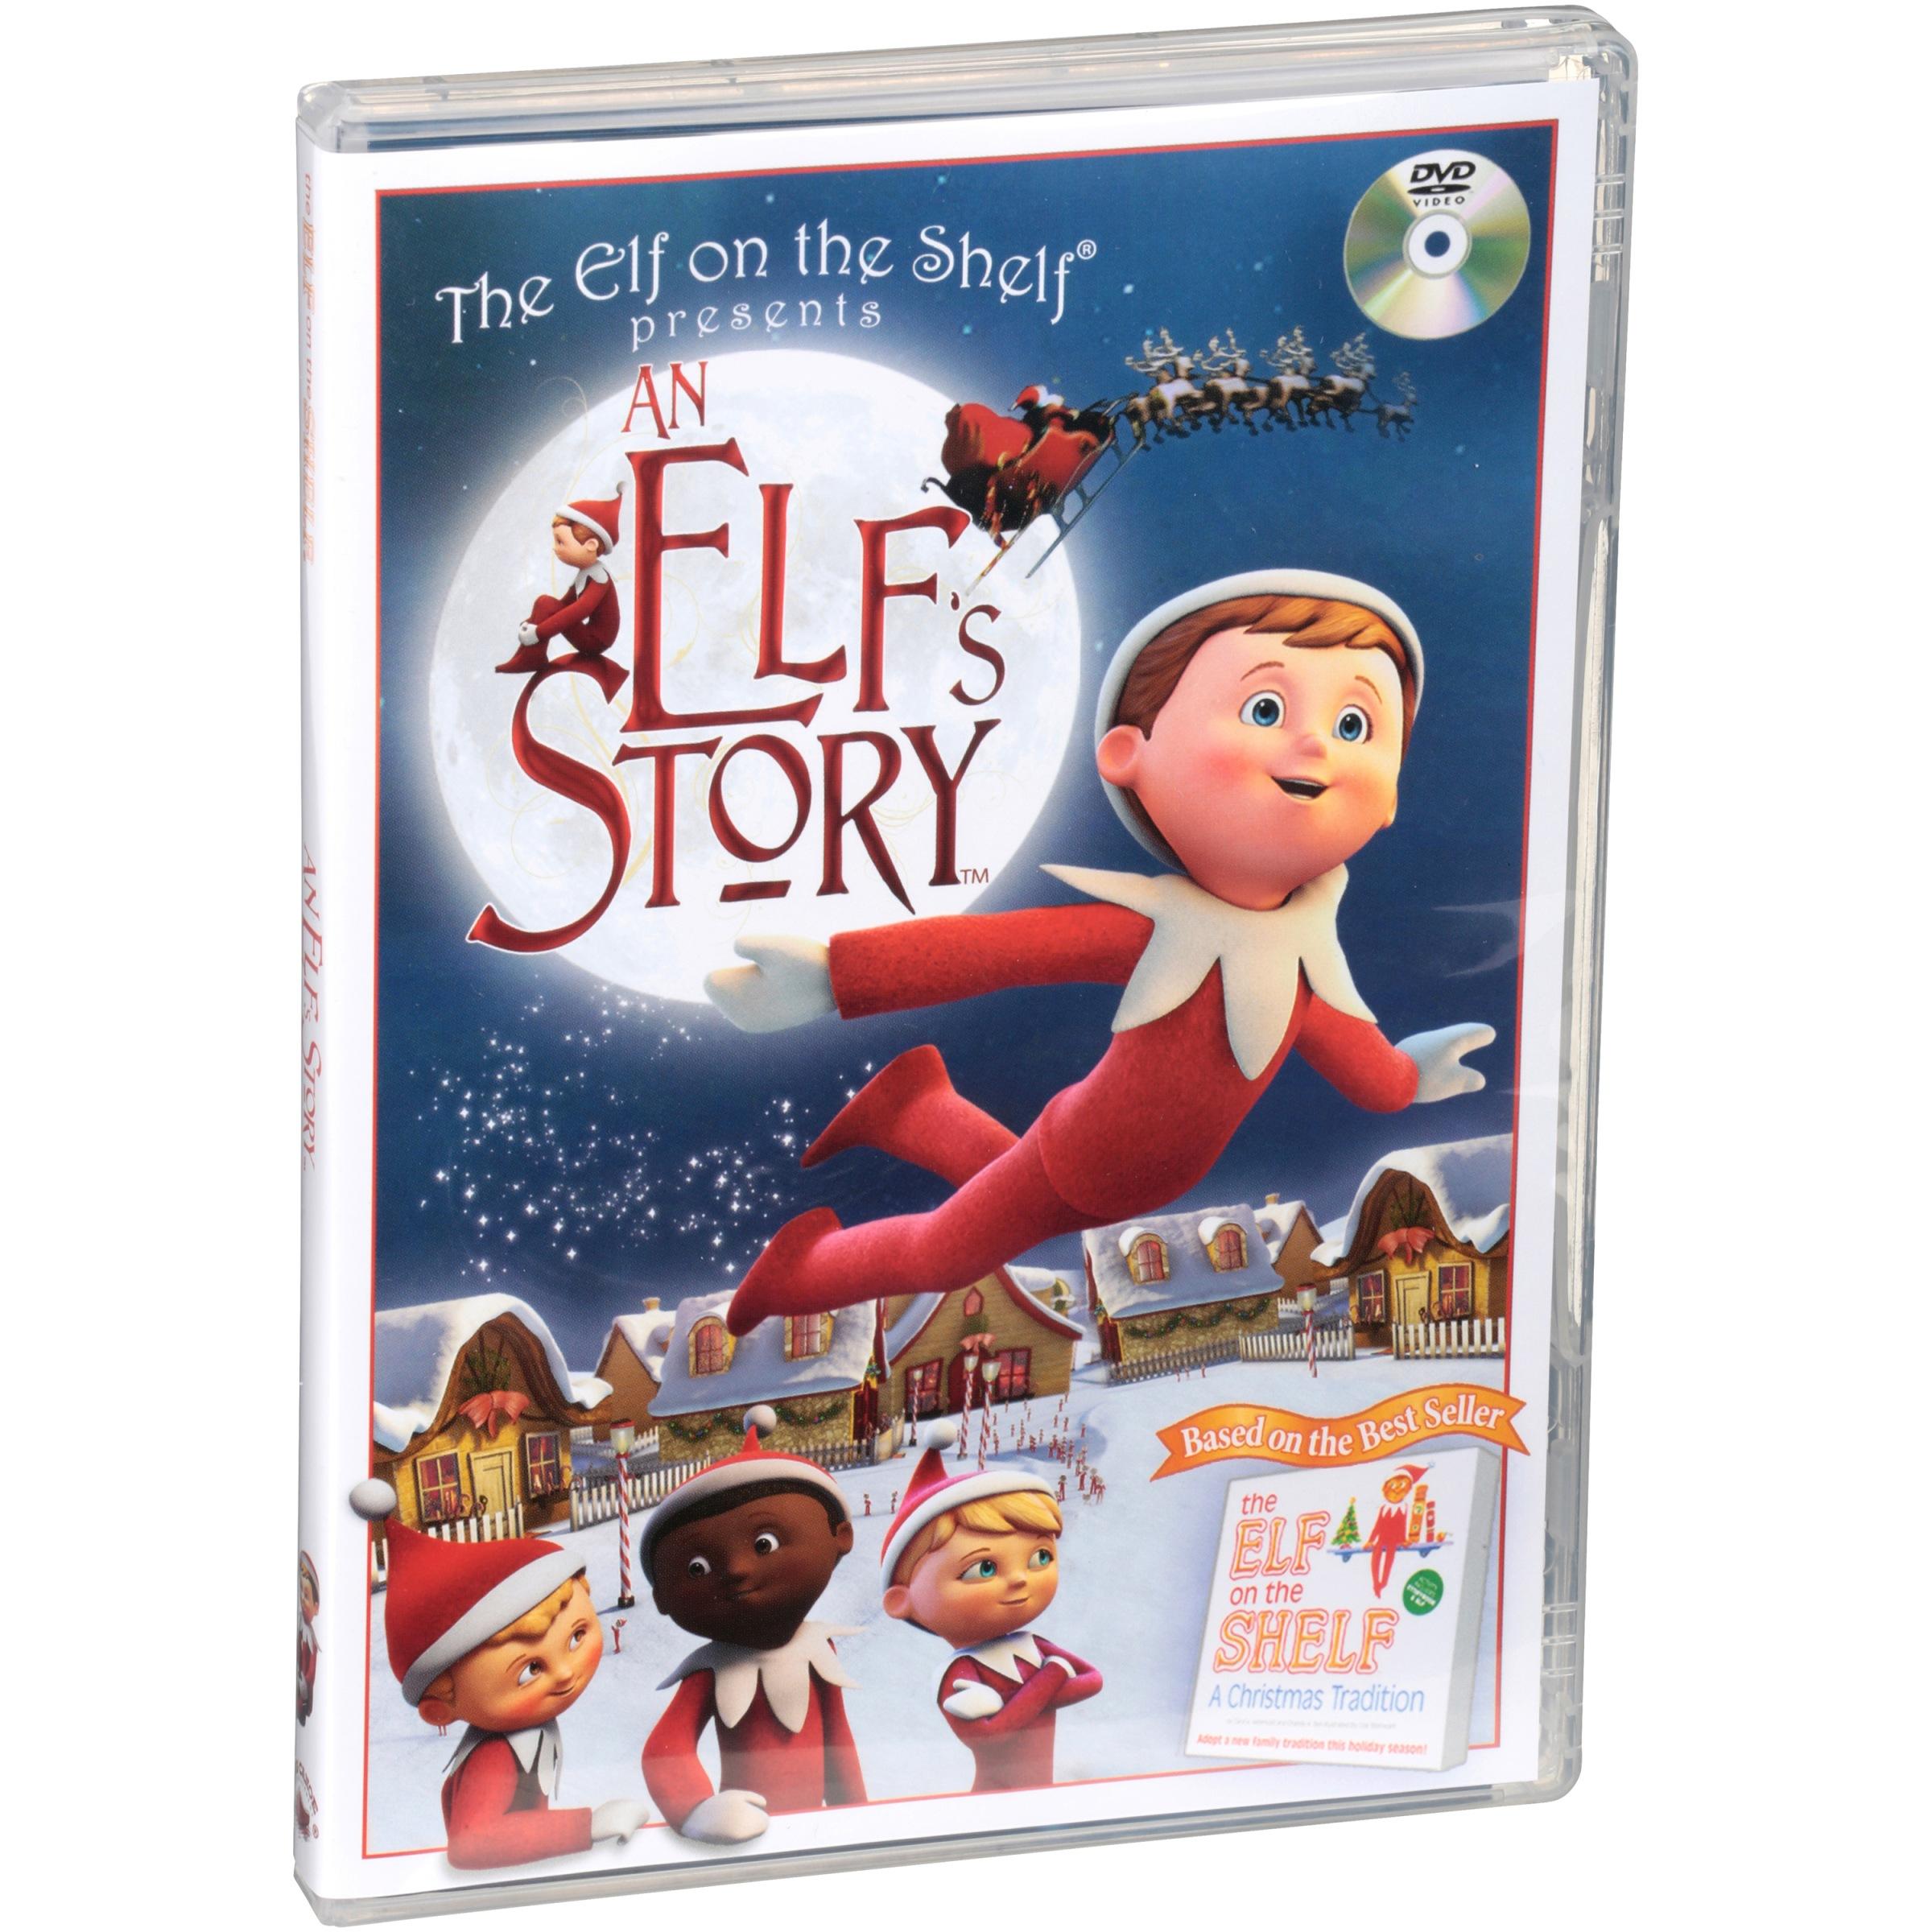 Elf on the Shelf® Presents An Elf's Story™ (DVD)